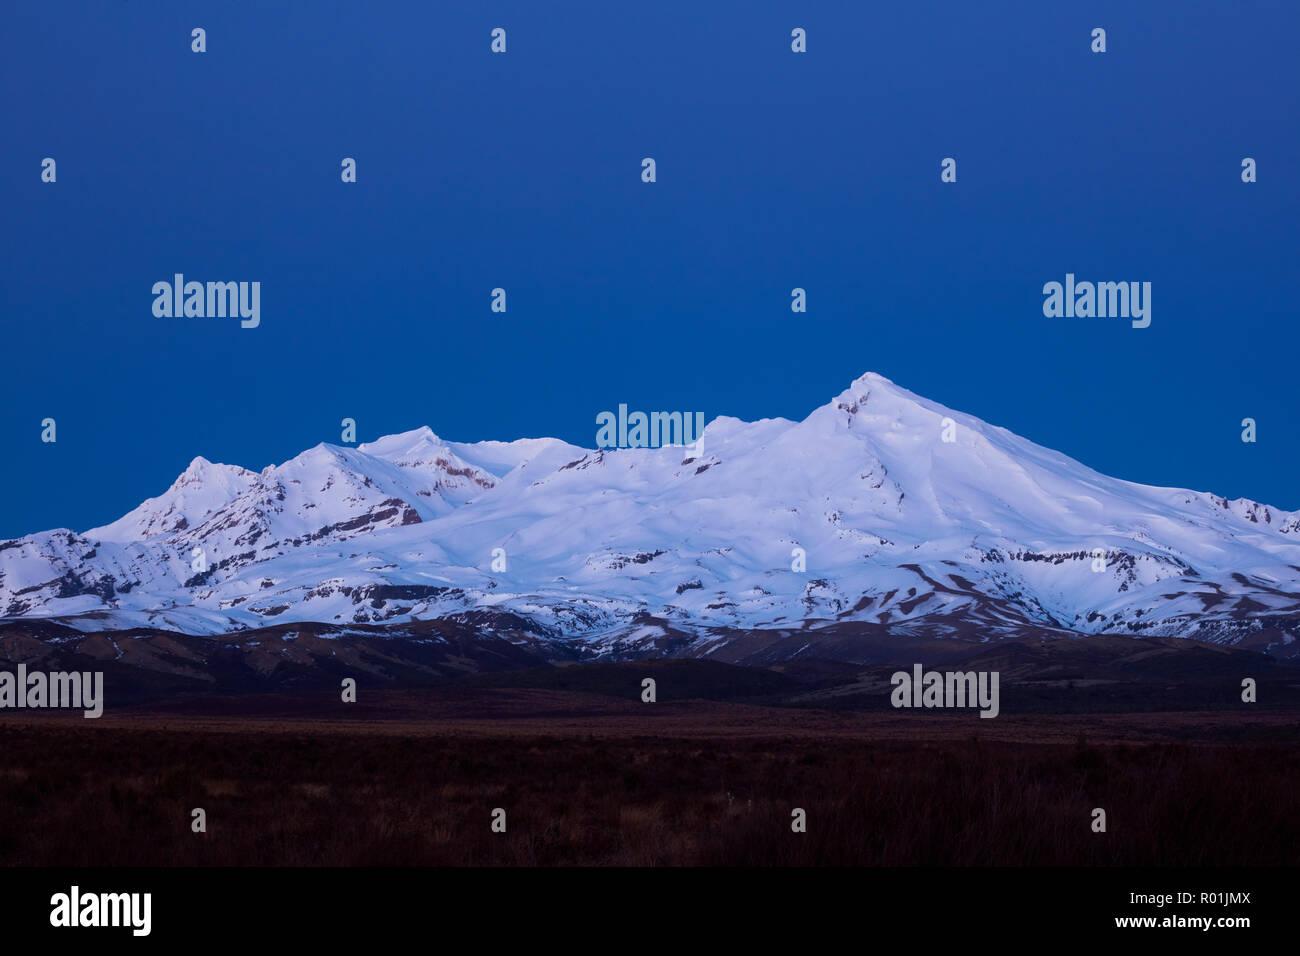 Mt Ruapehu at dawn, Tongariro National Park, Central Plateau, North Island, New Zealand - Stock Image